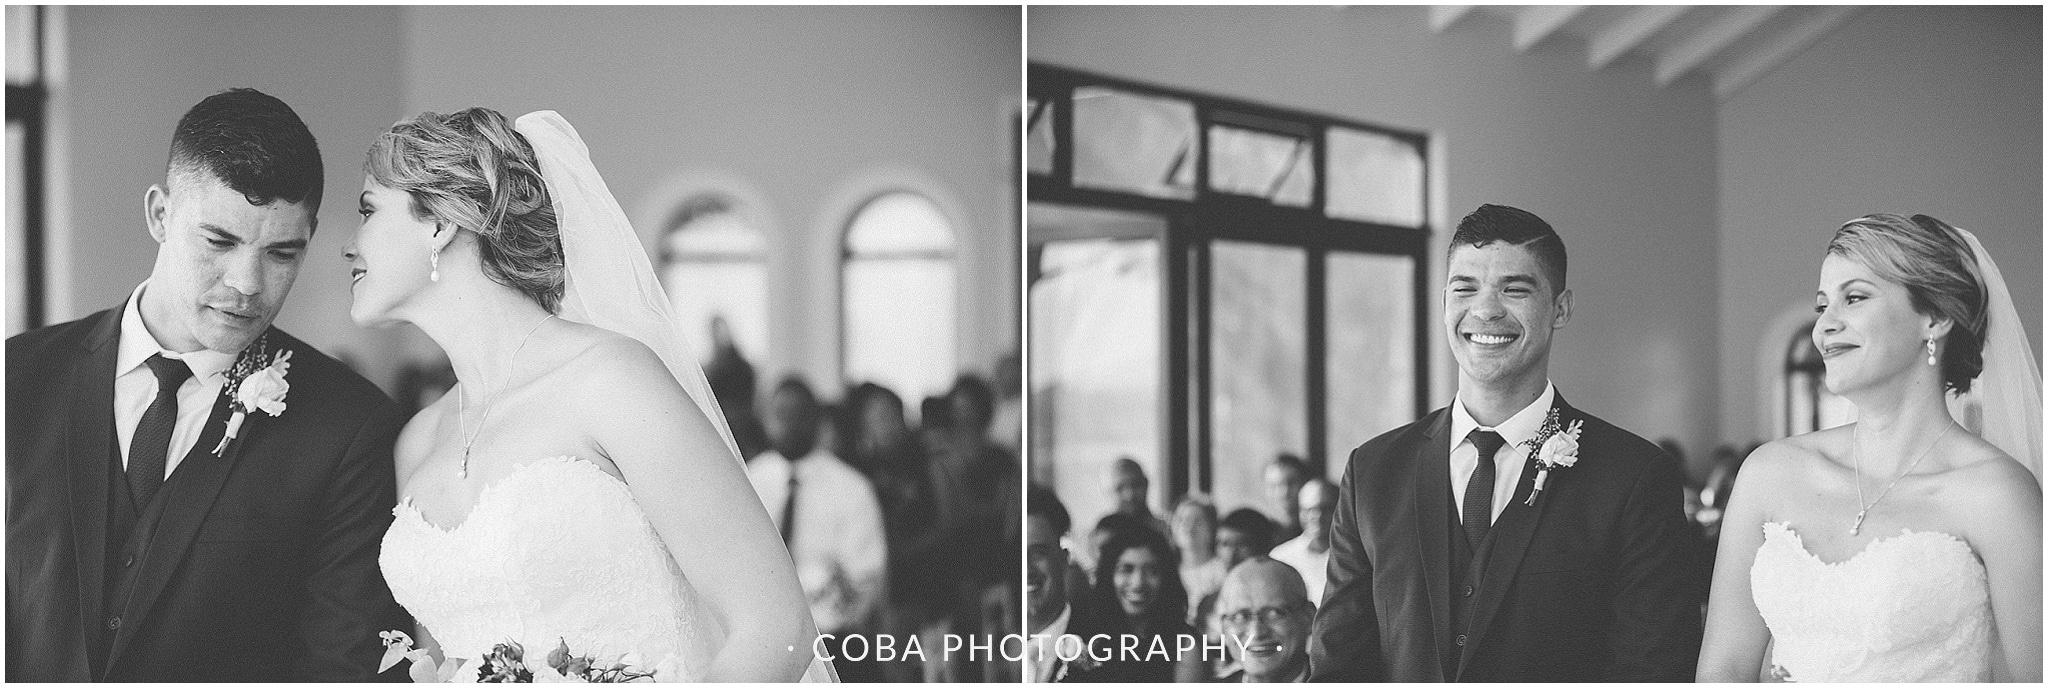 Fernando & Taime - Bakenhof - Coba Photography (64)